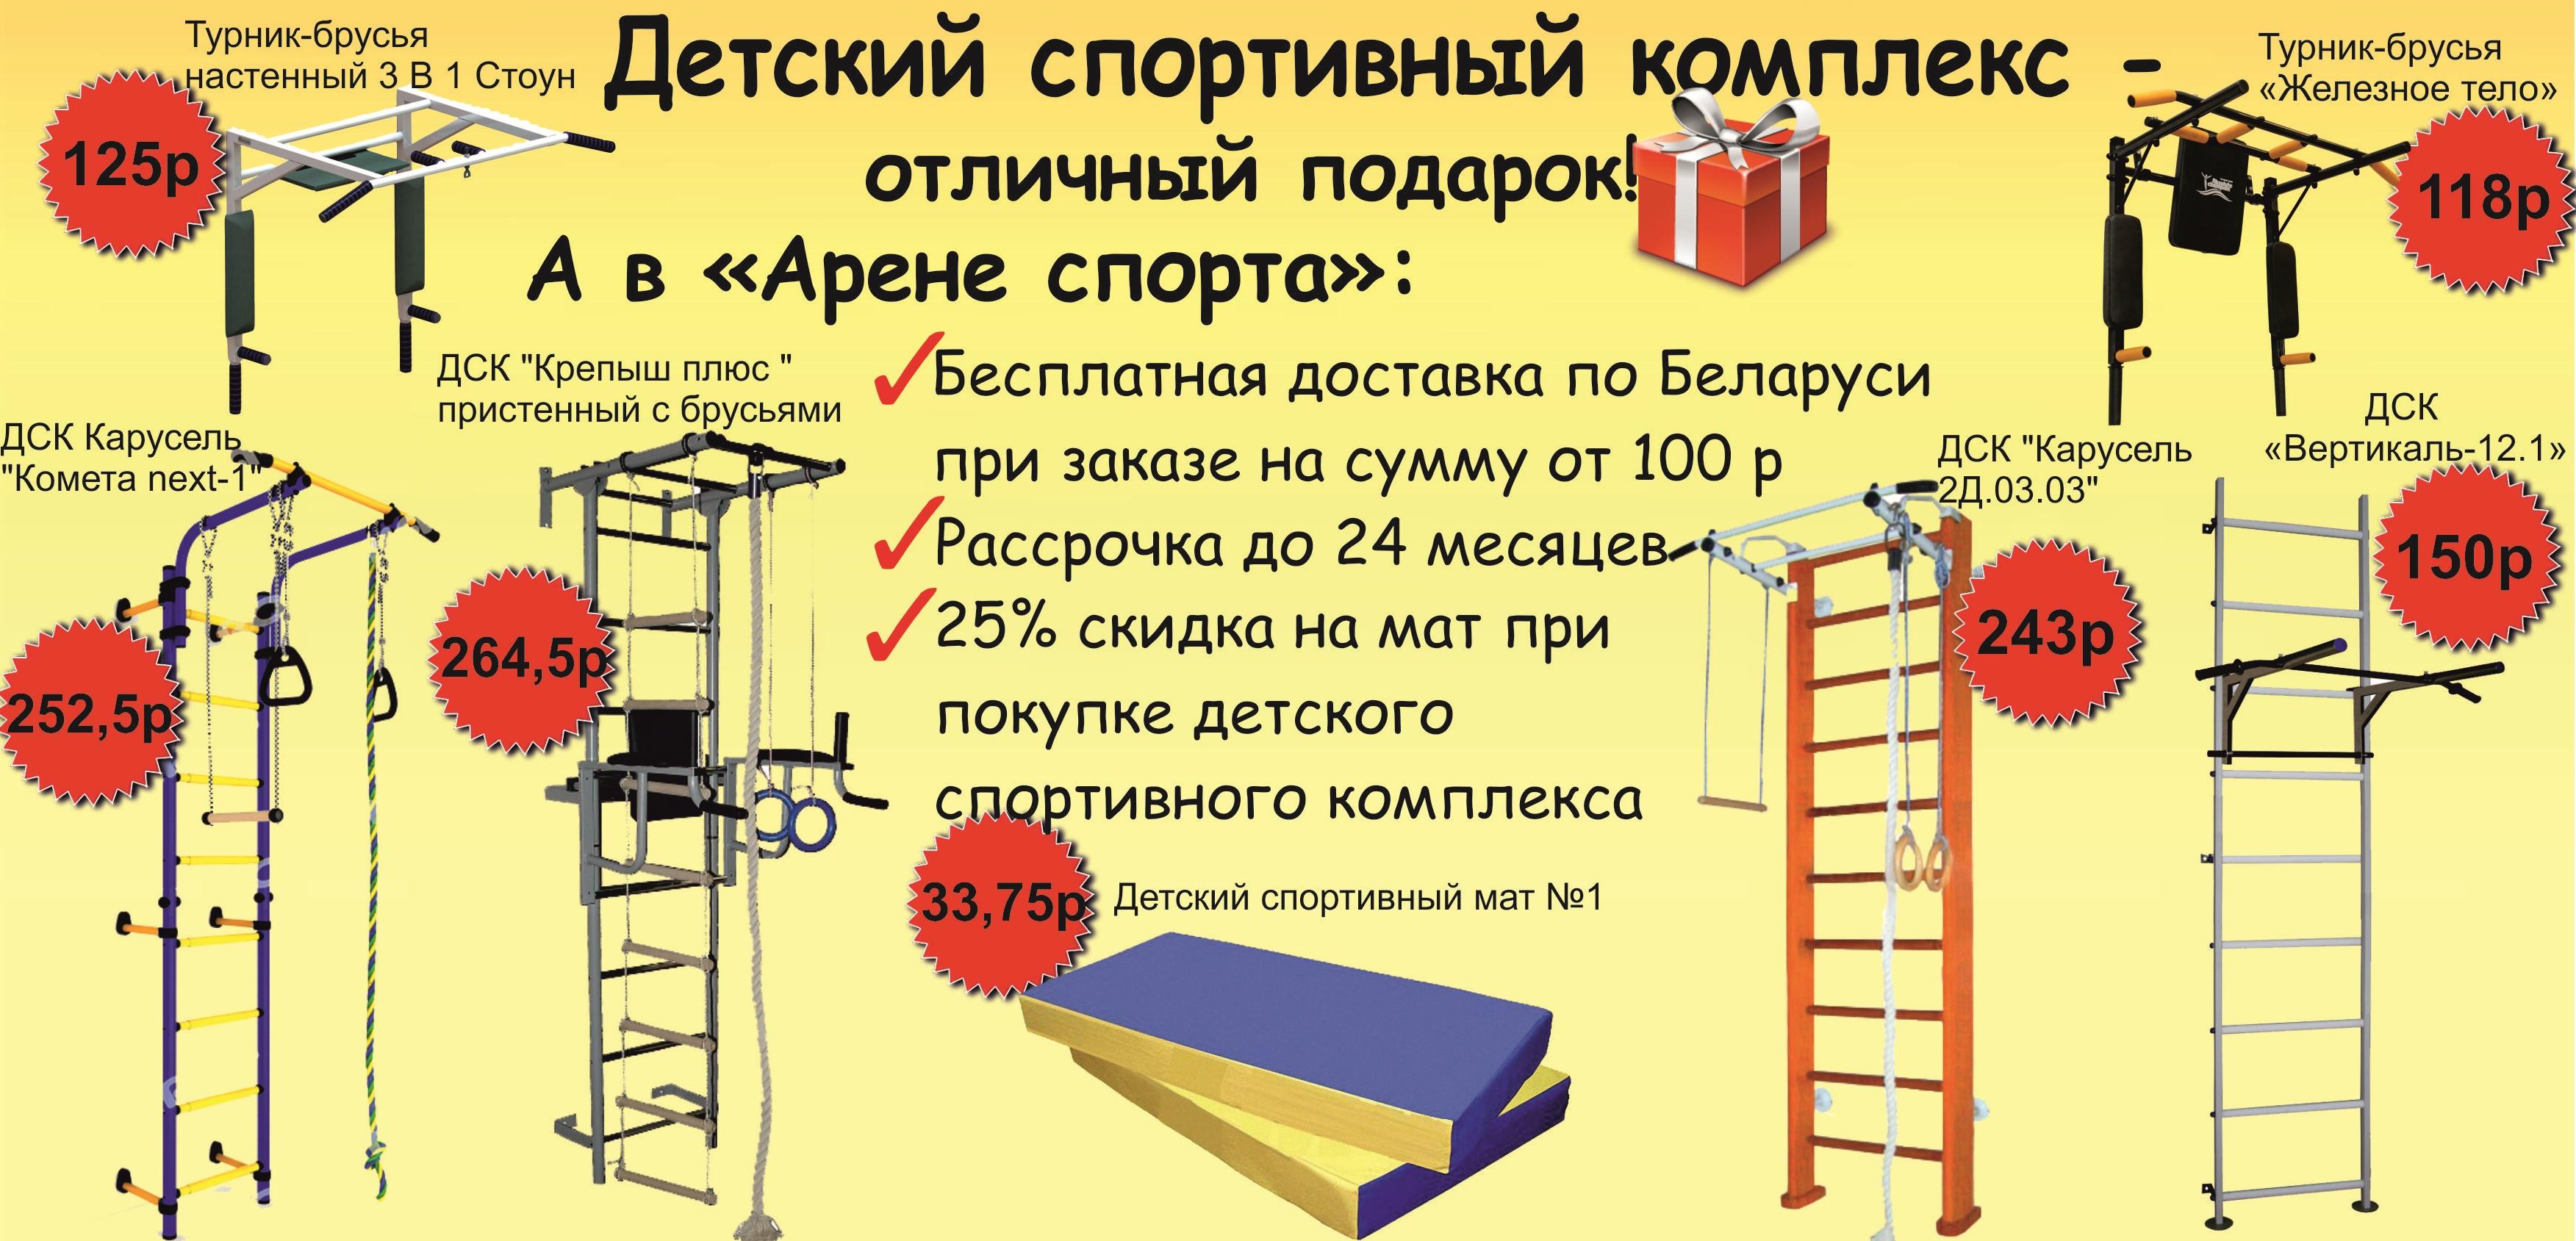 http://arena-sporta.by/catalog/detskie-sportivnye-kompleksy